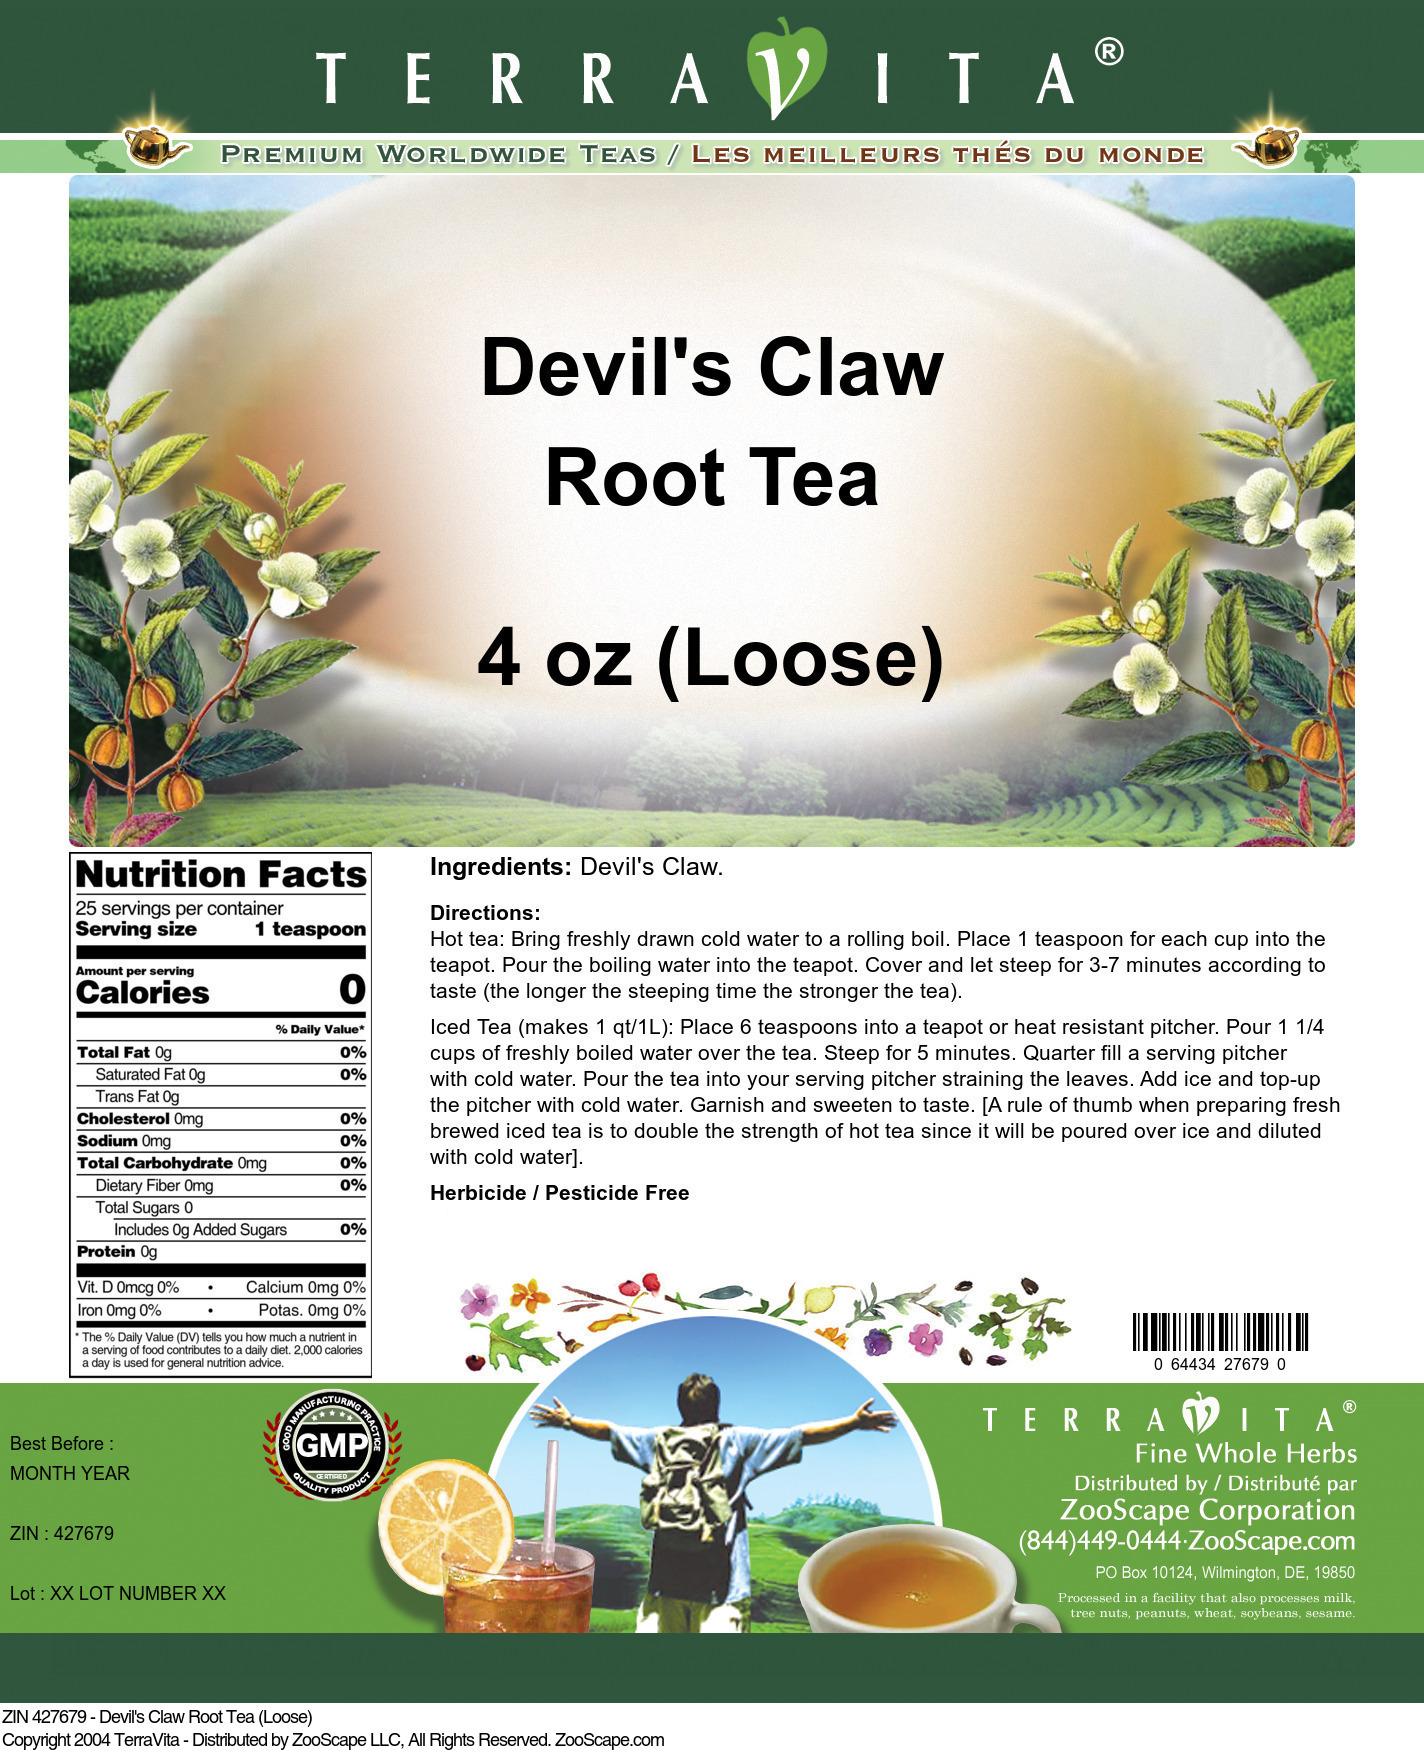 Devil's Claw Root Tea (Loose)